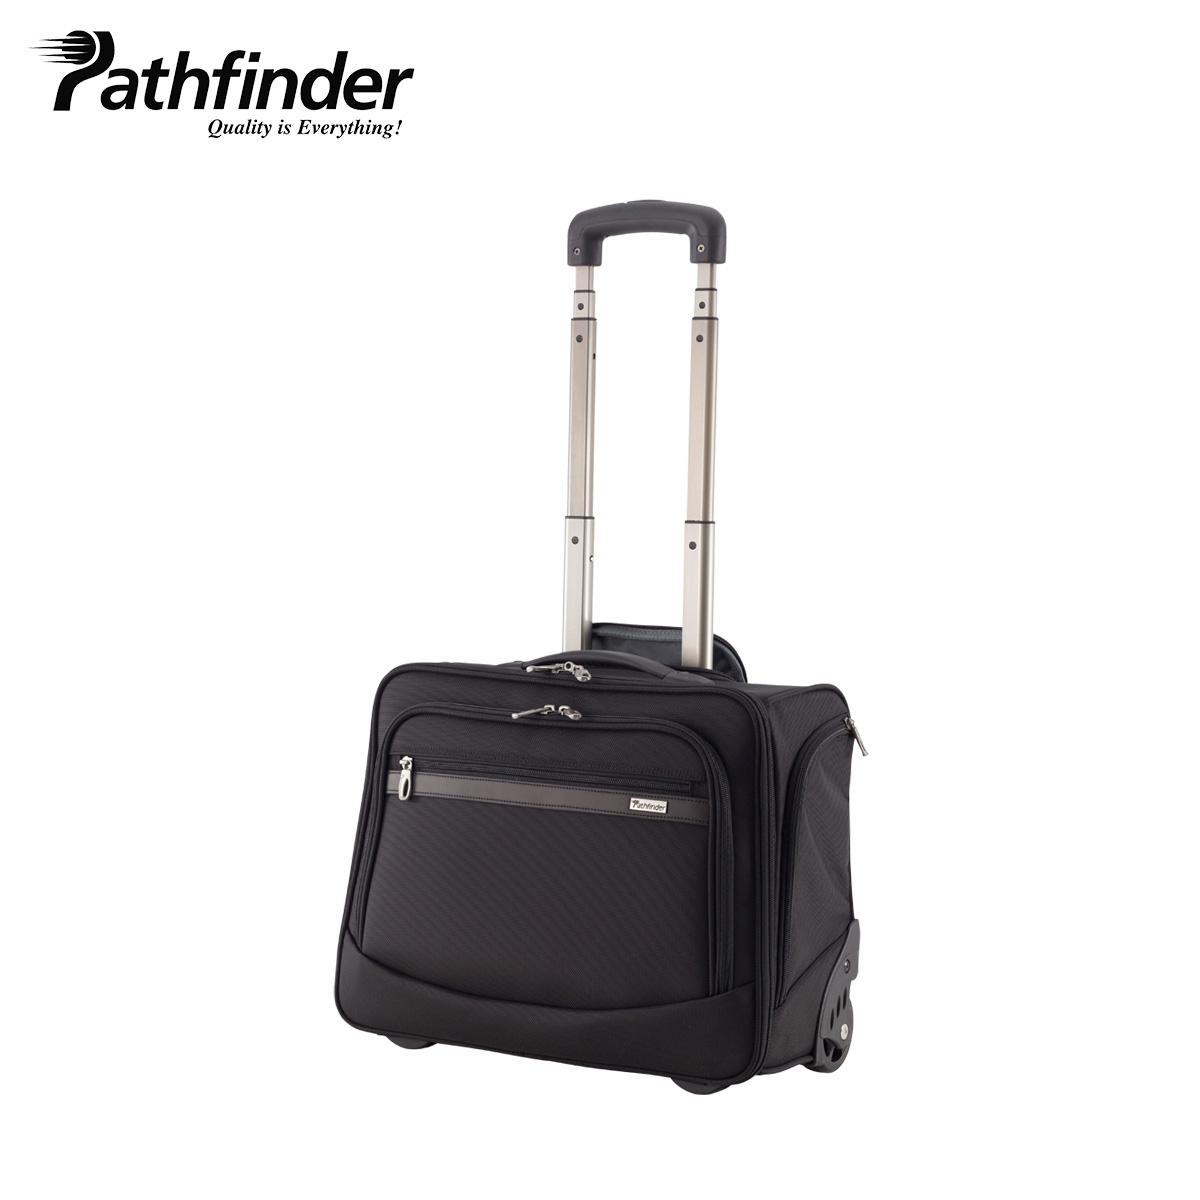 Pathfinder パスファインダー バッグ キャリーケース キャリーバッグ スーツケース 20L メンズ 機内持ち込み ソフト AVENGER ブラック 黒 PF1817B